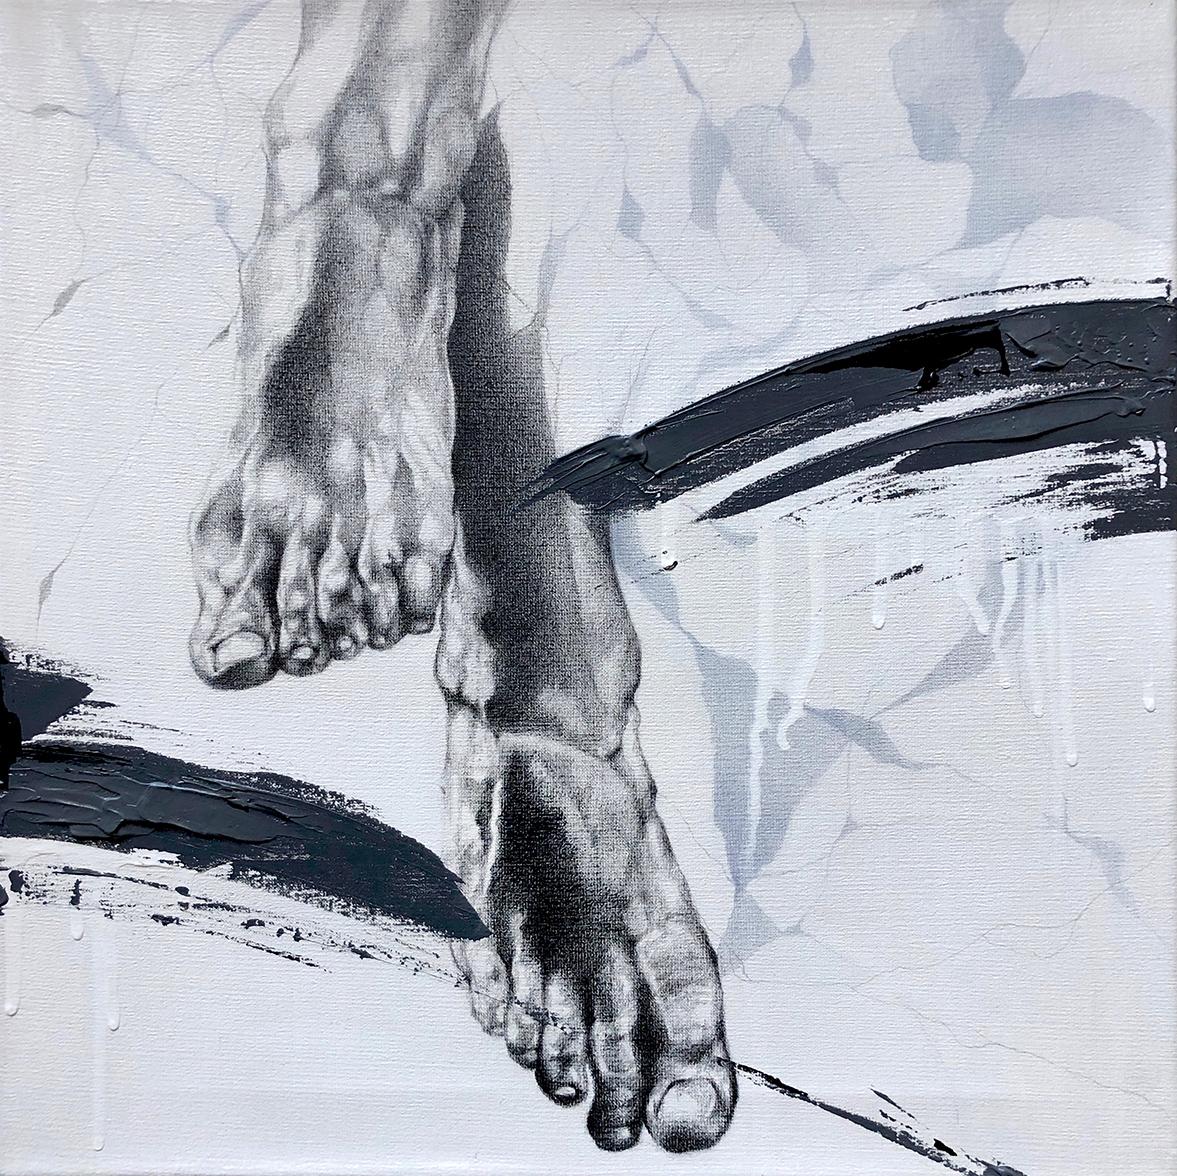 Ale Feijó | No me elijas por parte. tómame entera I. Técnica mixta, lápiz, carbonilla, tinta y acrílico sobre lienzo. 40 x 40 cm